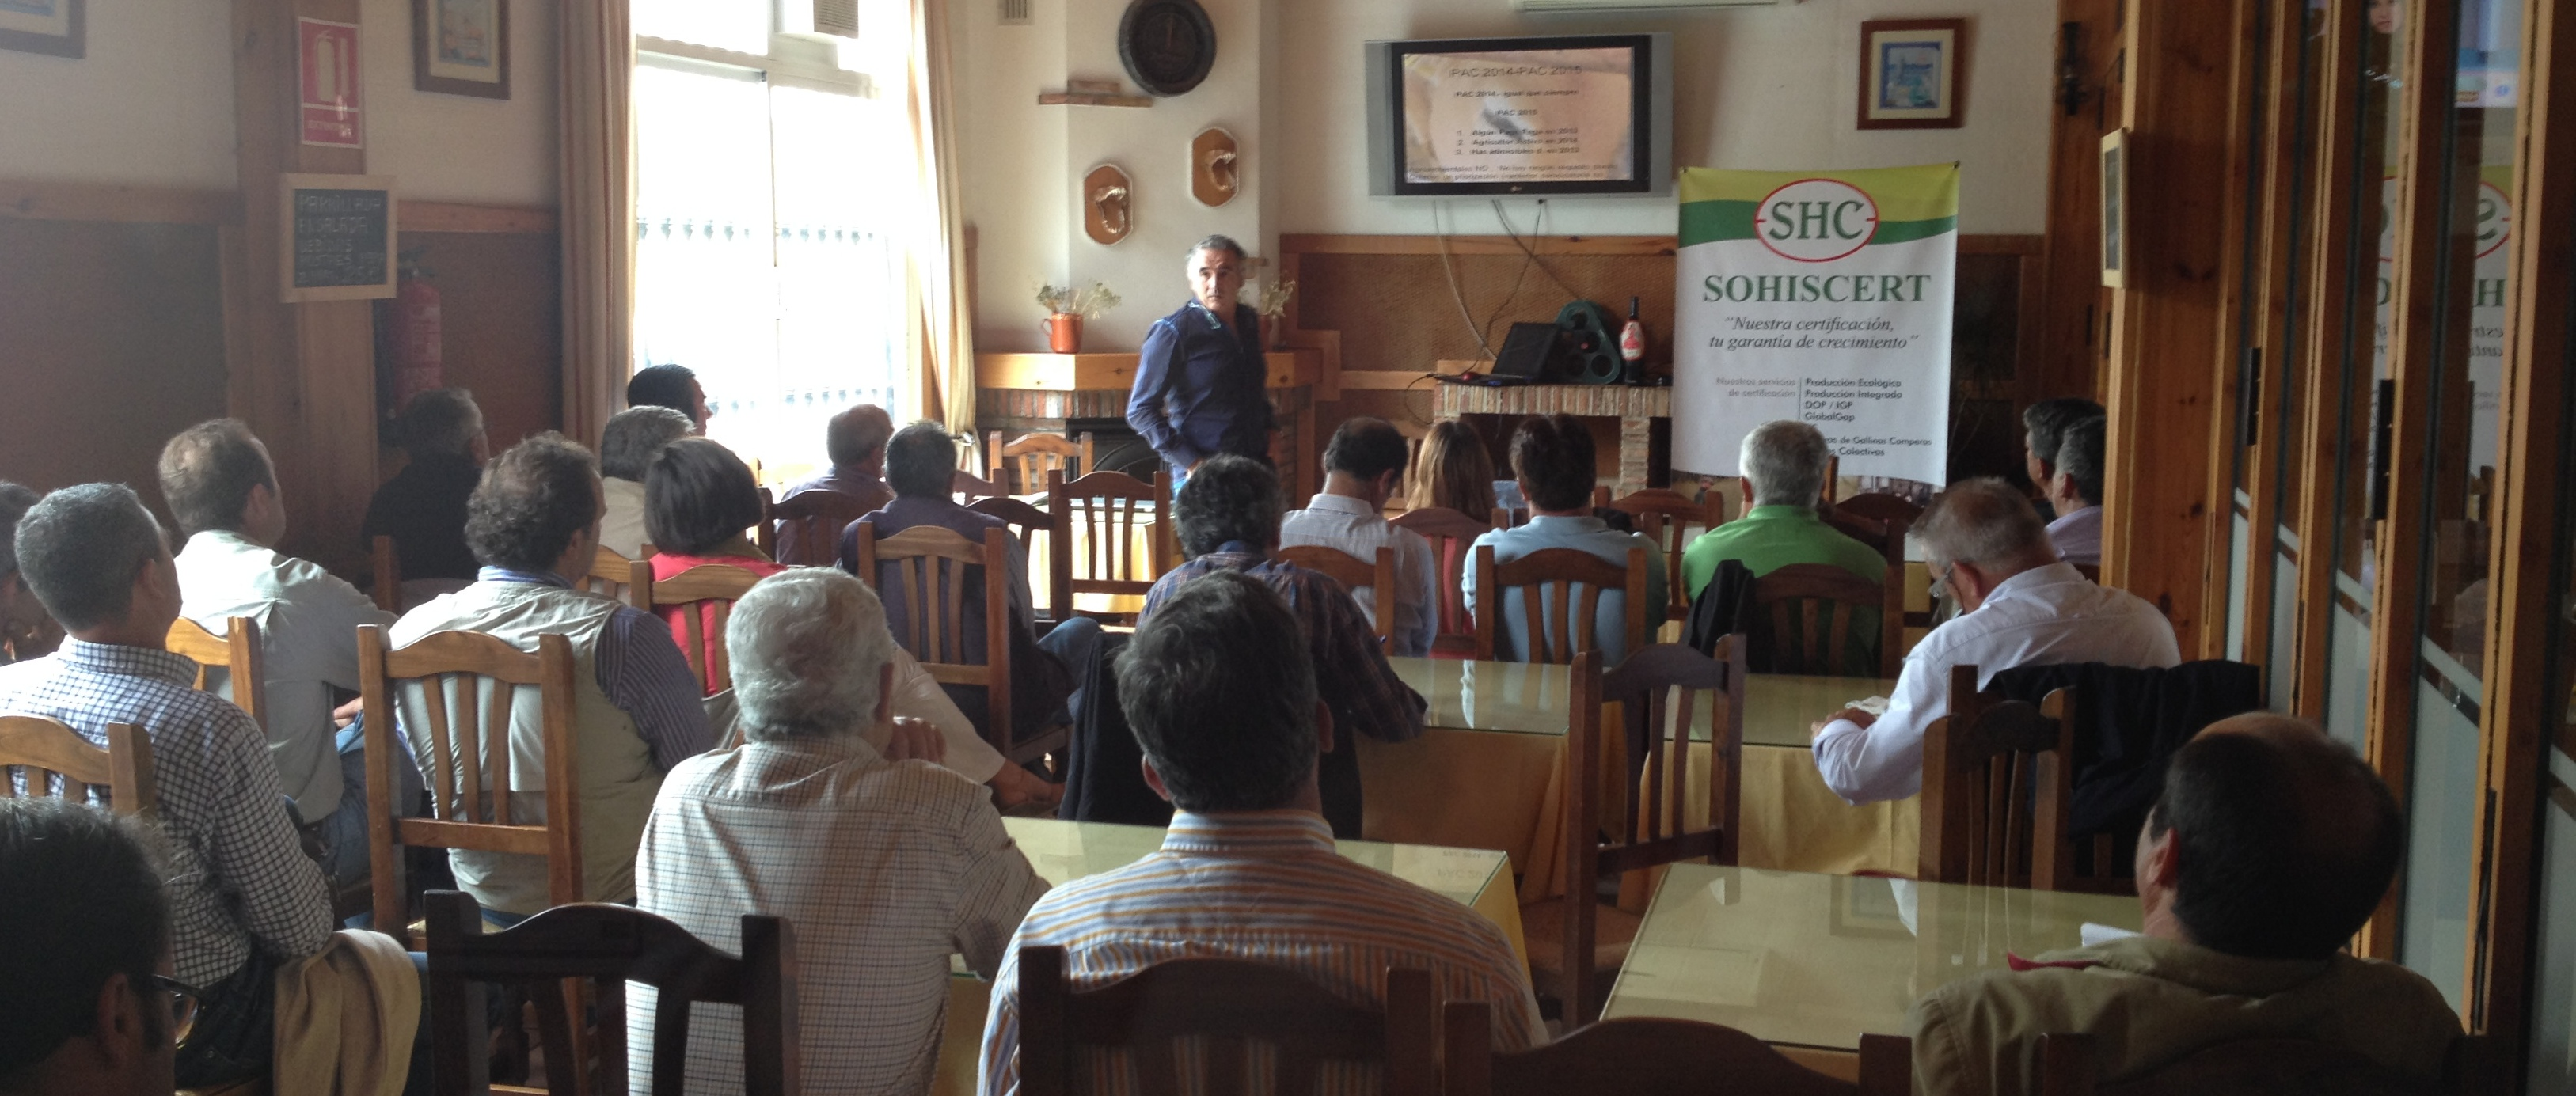 Presentación de fundación agroecosistema en medina sidónia ...